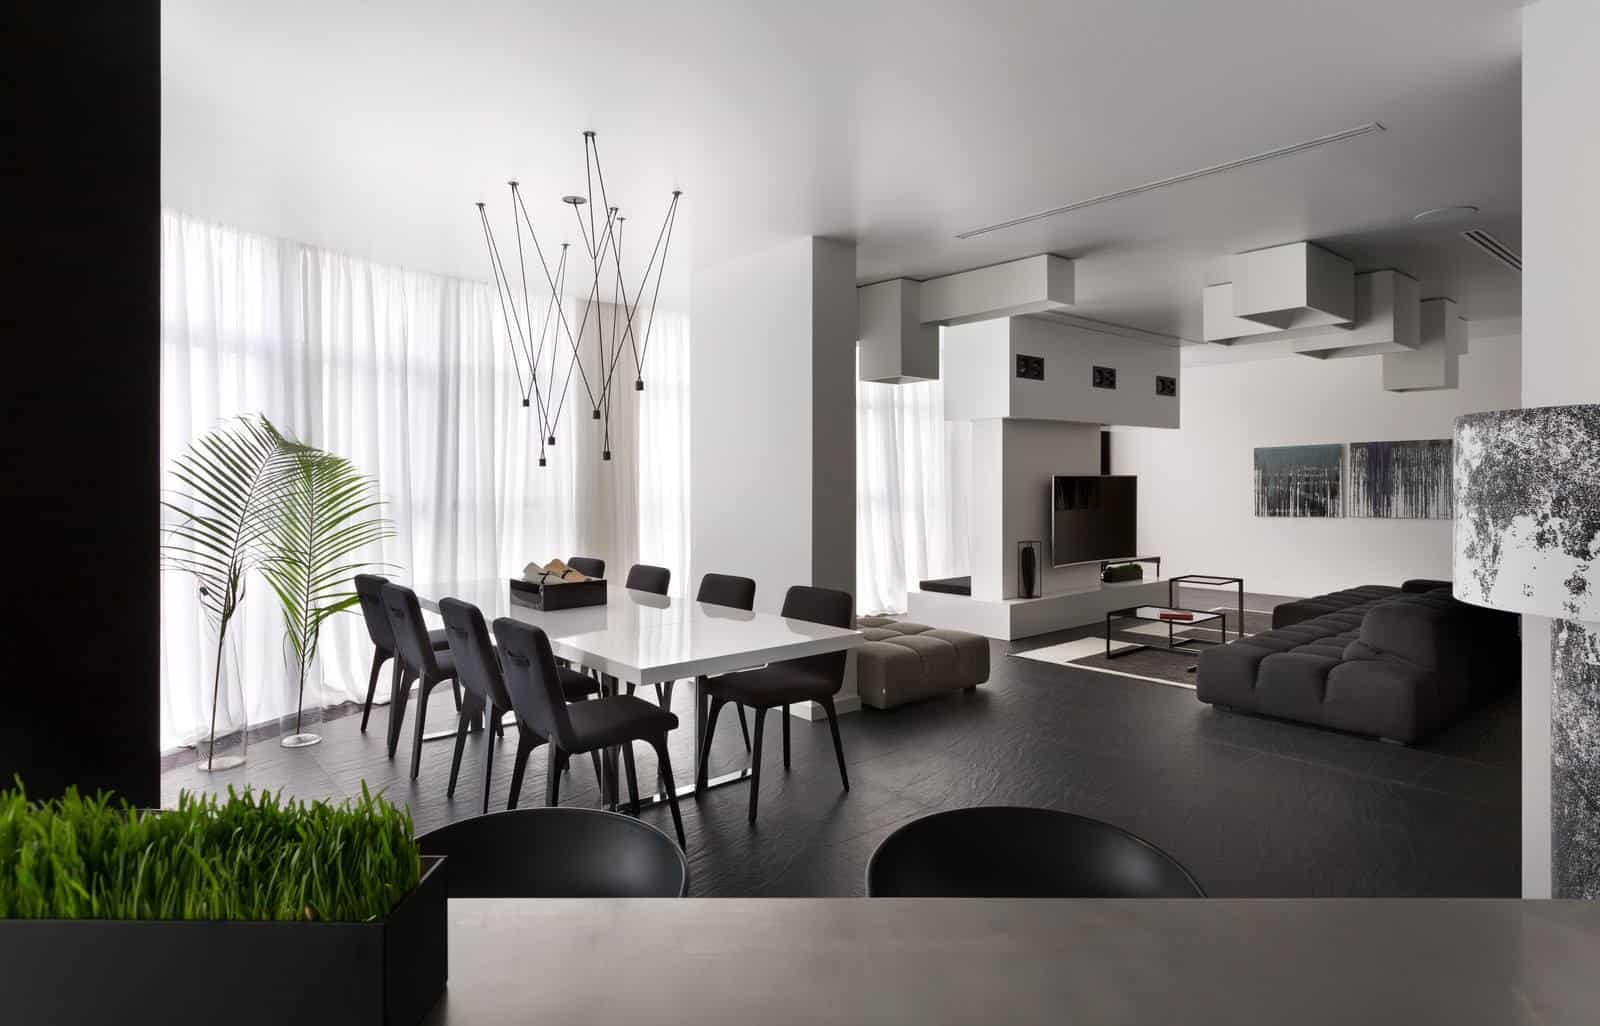 thiet-ke-noi-that-chung-cu-mai-dich-7 Thiết kế nội thất chung cư Mai Dịch - A. Sinh